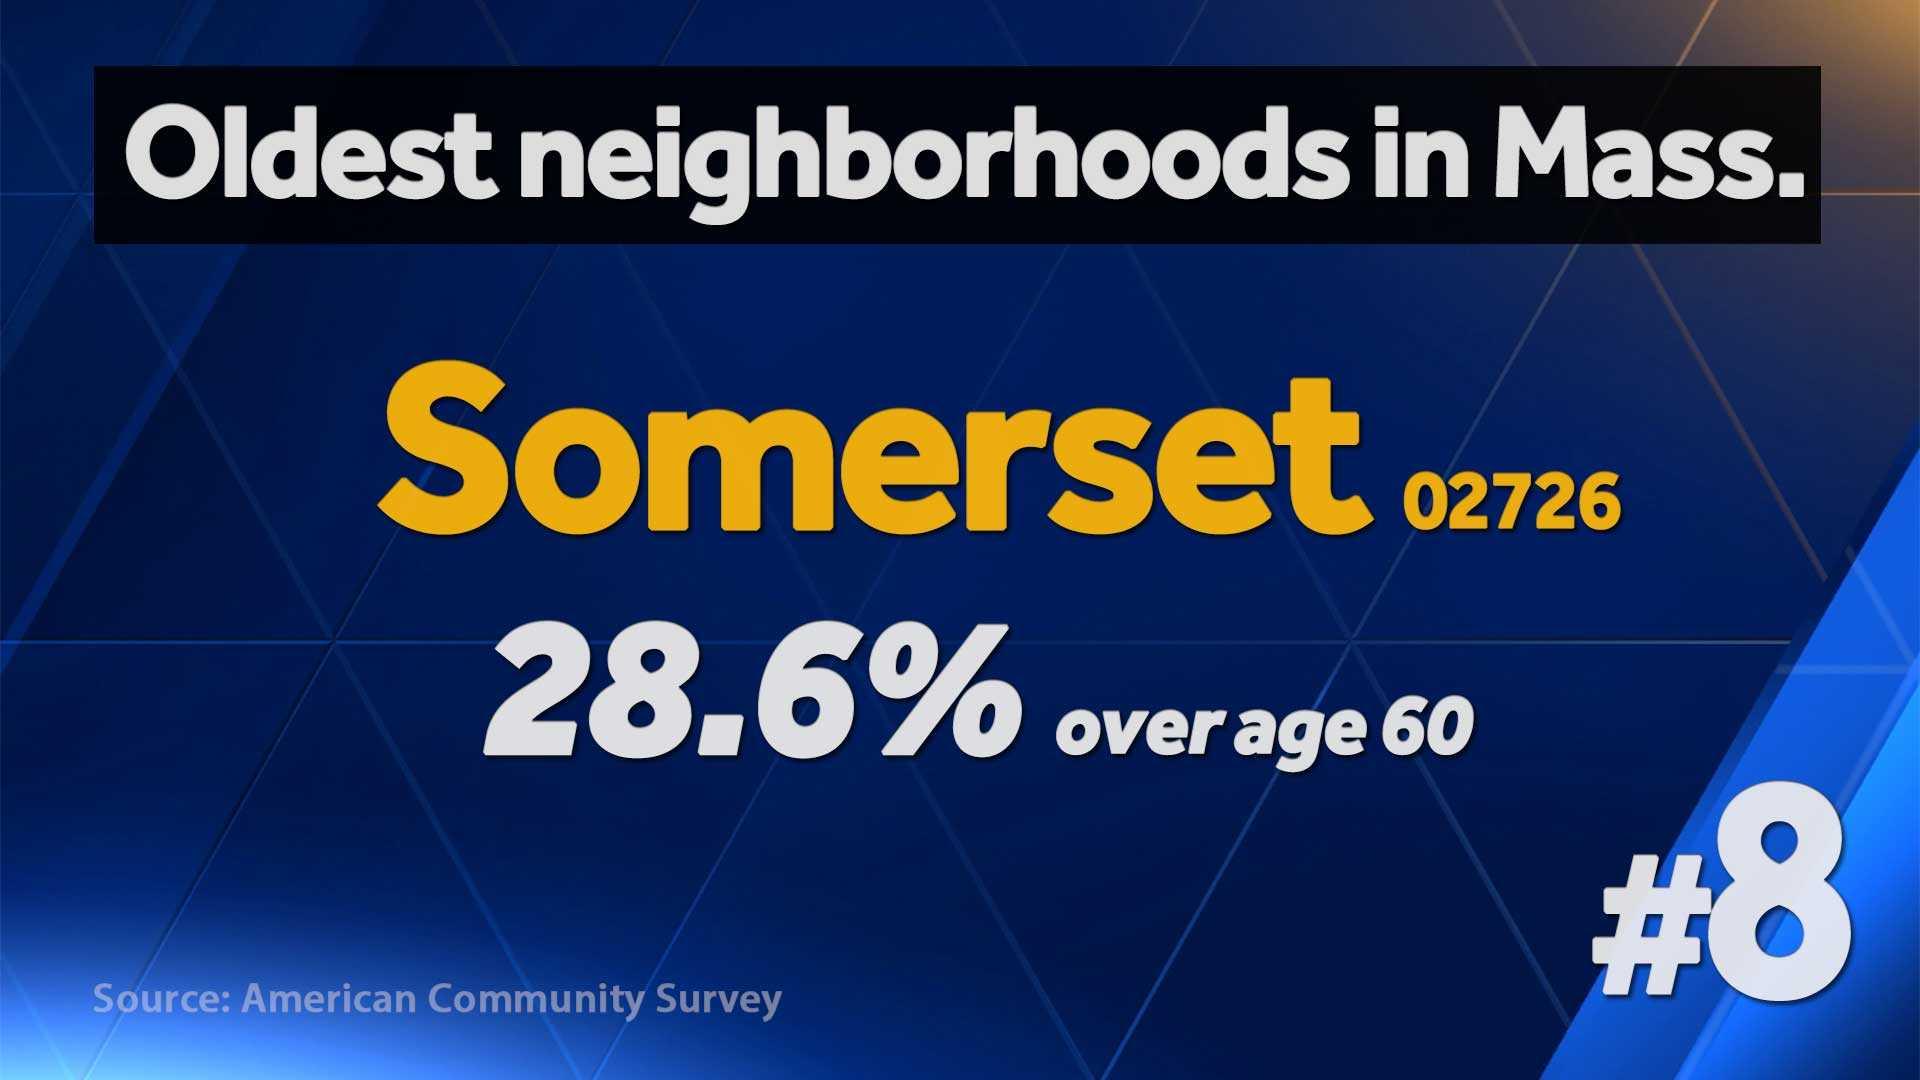 Oldest neighborhoods in Massachusetts